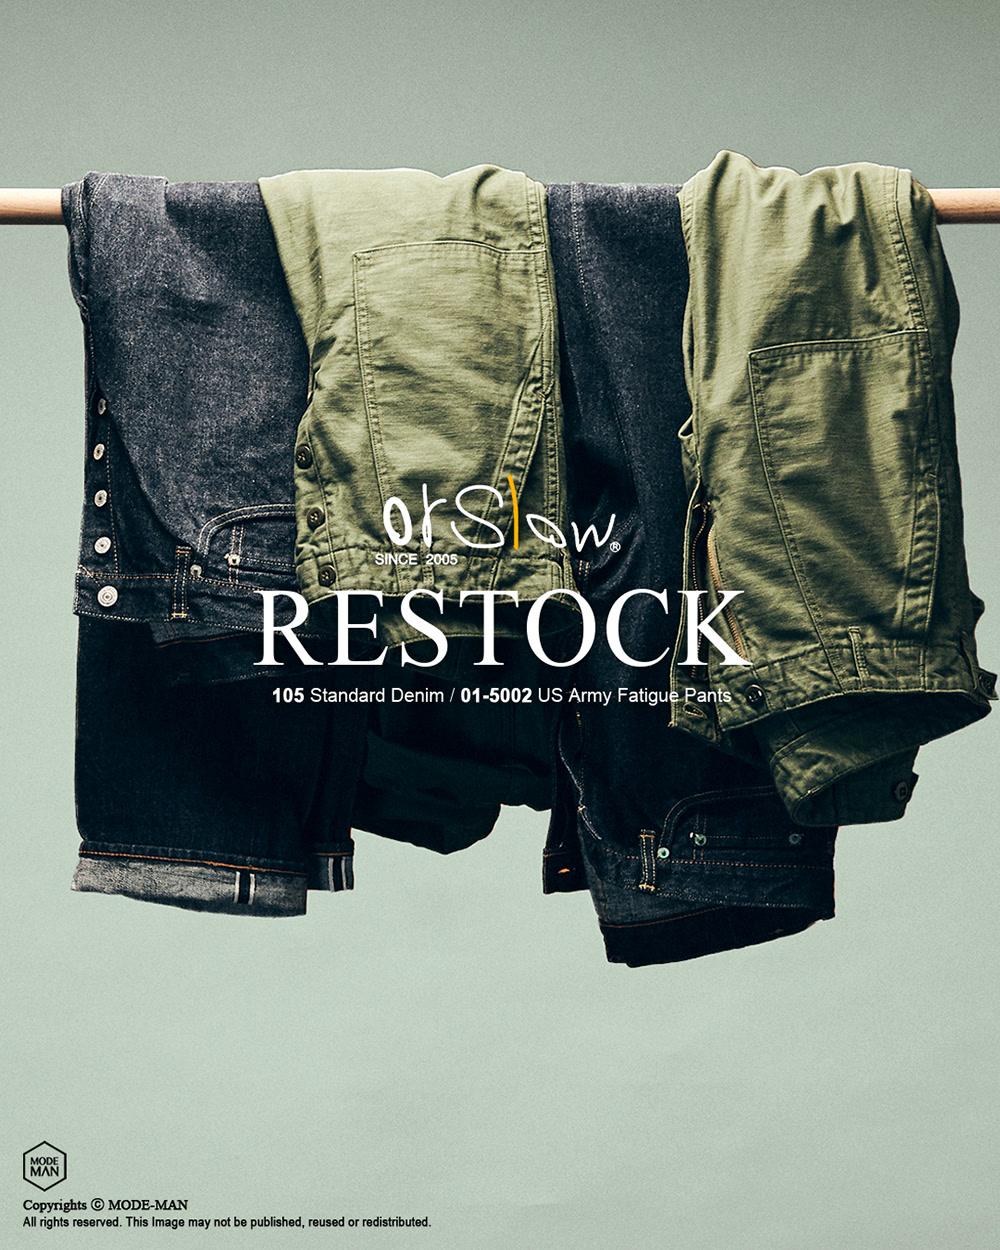 [ORSLOW] FATIGUE PANTS / 105 DENIM PANTS RESTOCK